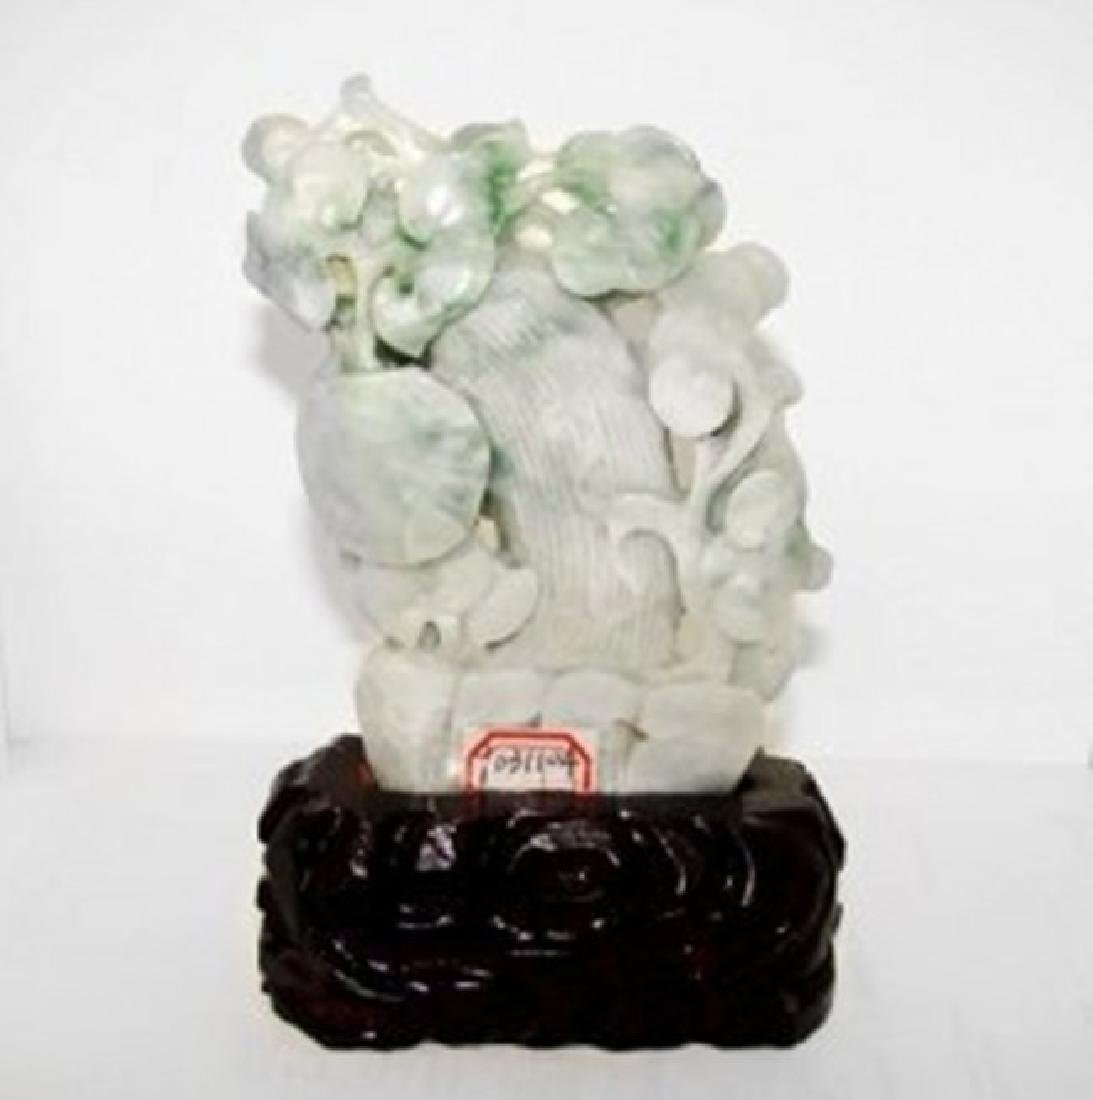 19th Century Jade Hand Carved Squash Weight: 1.7 pound - 2